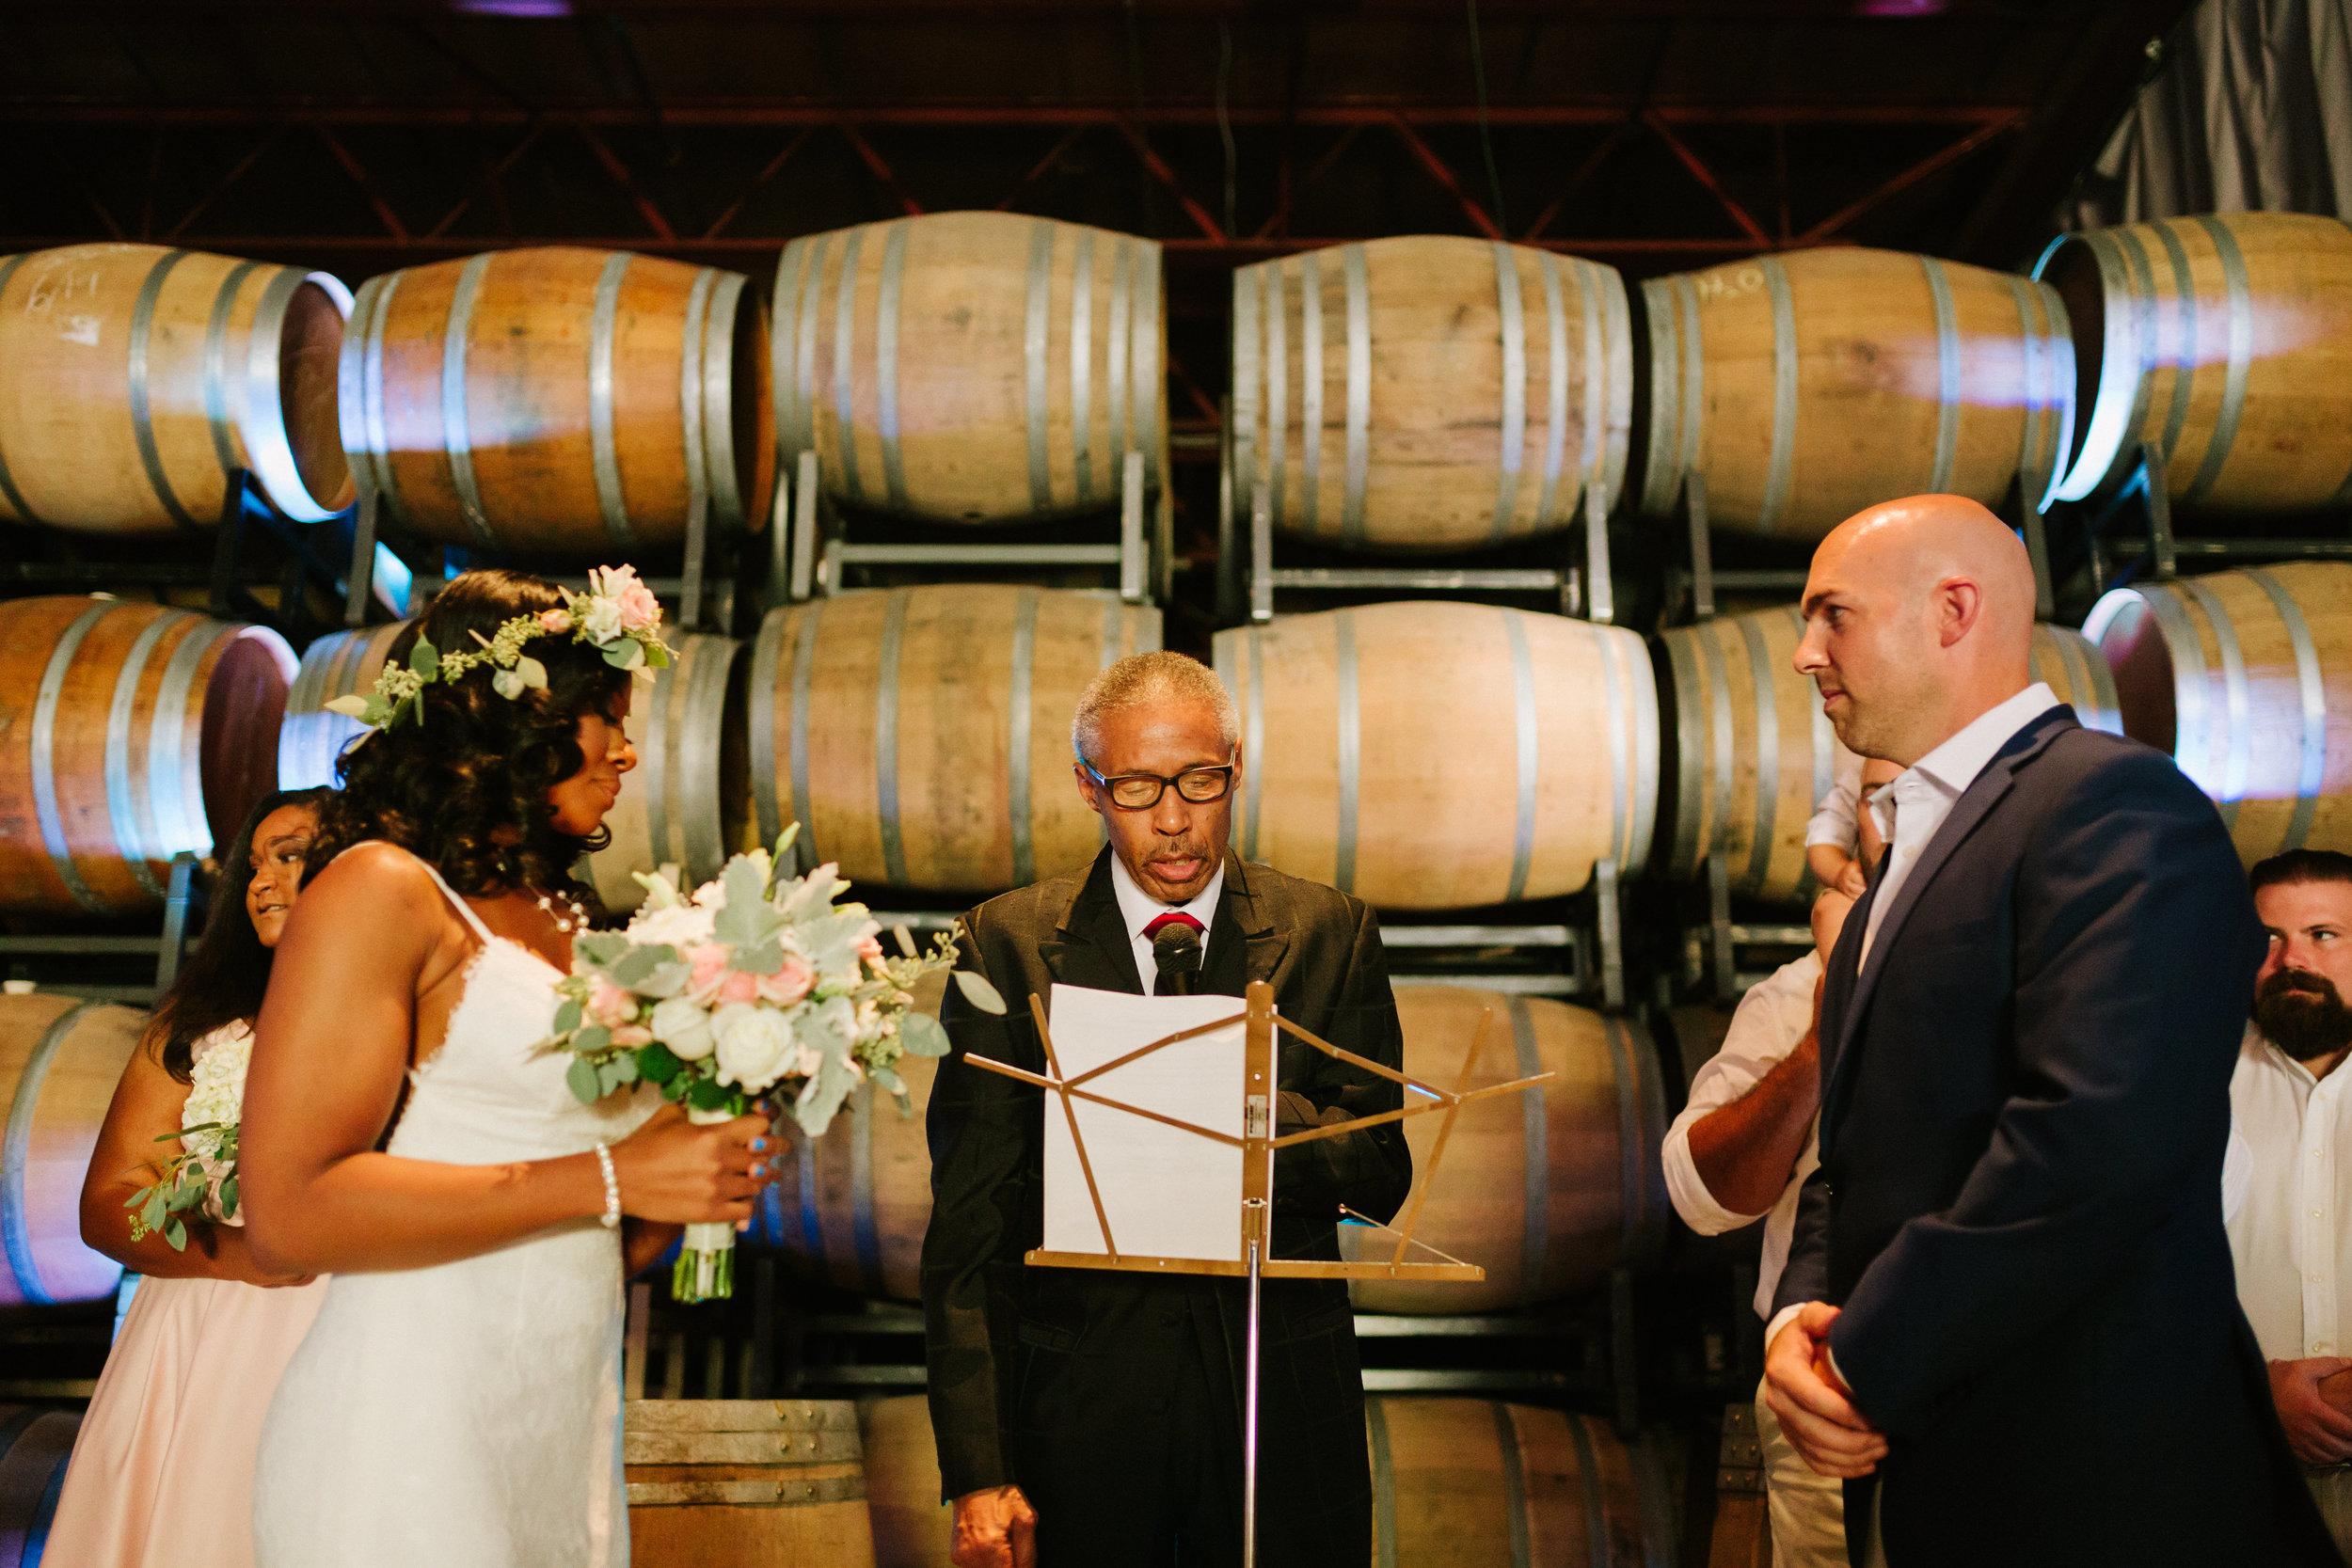 2017.09.16 Ashley and Chuck O'Day Quantam Leap Winery Wedding (145 of 462).jpg